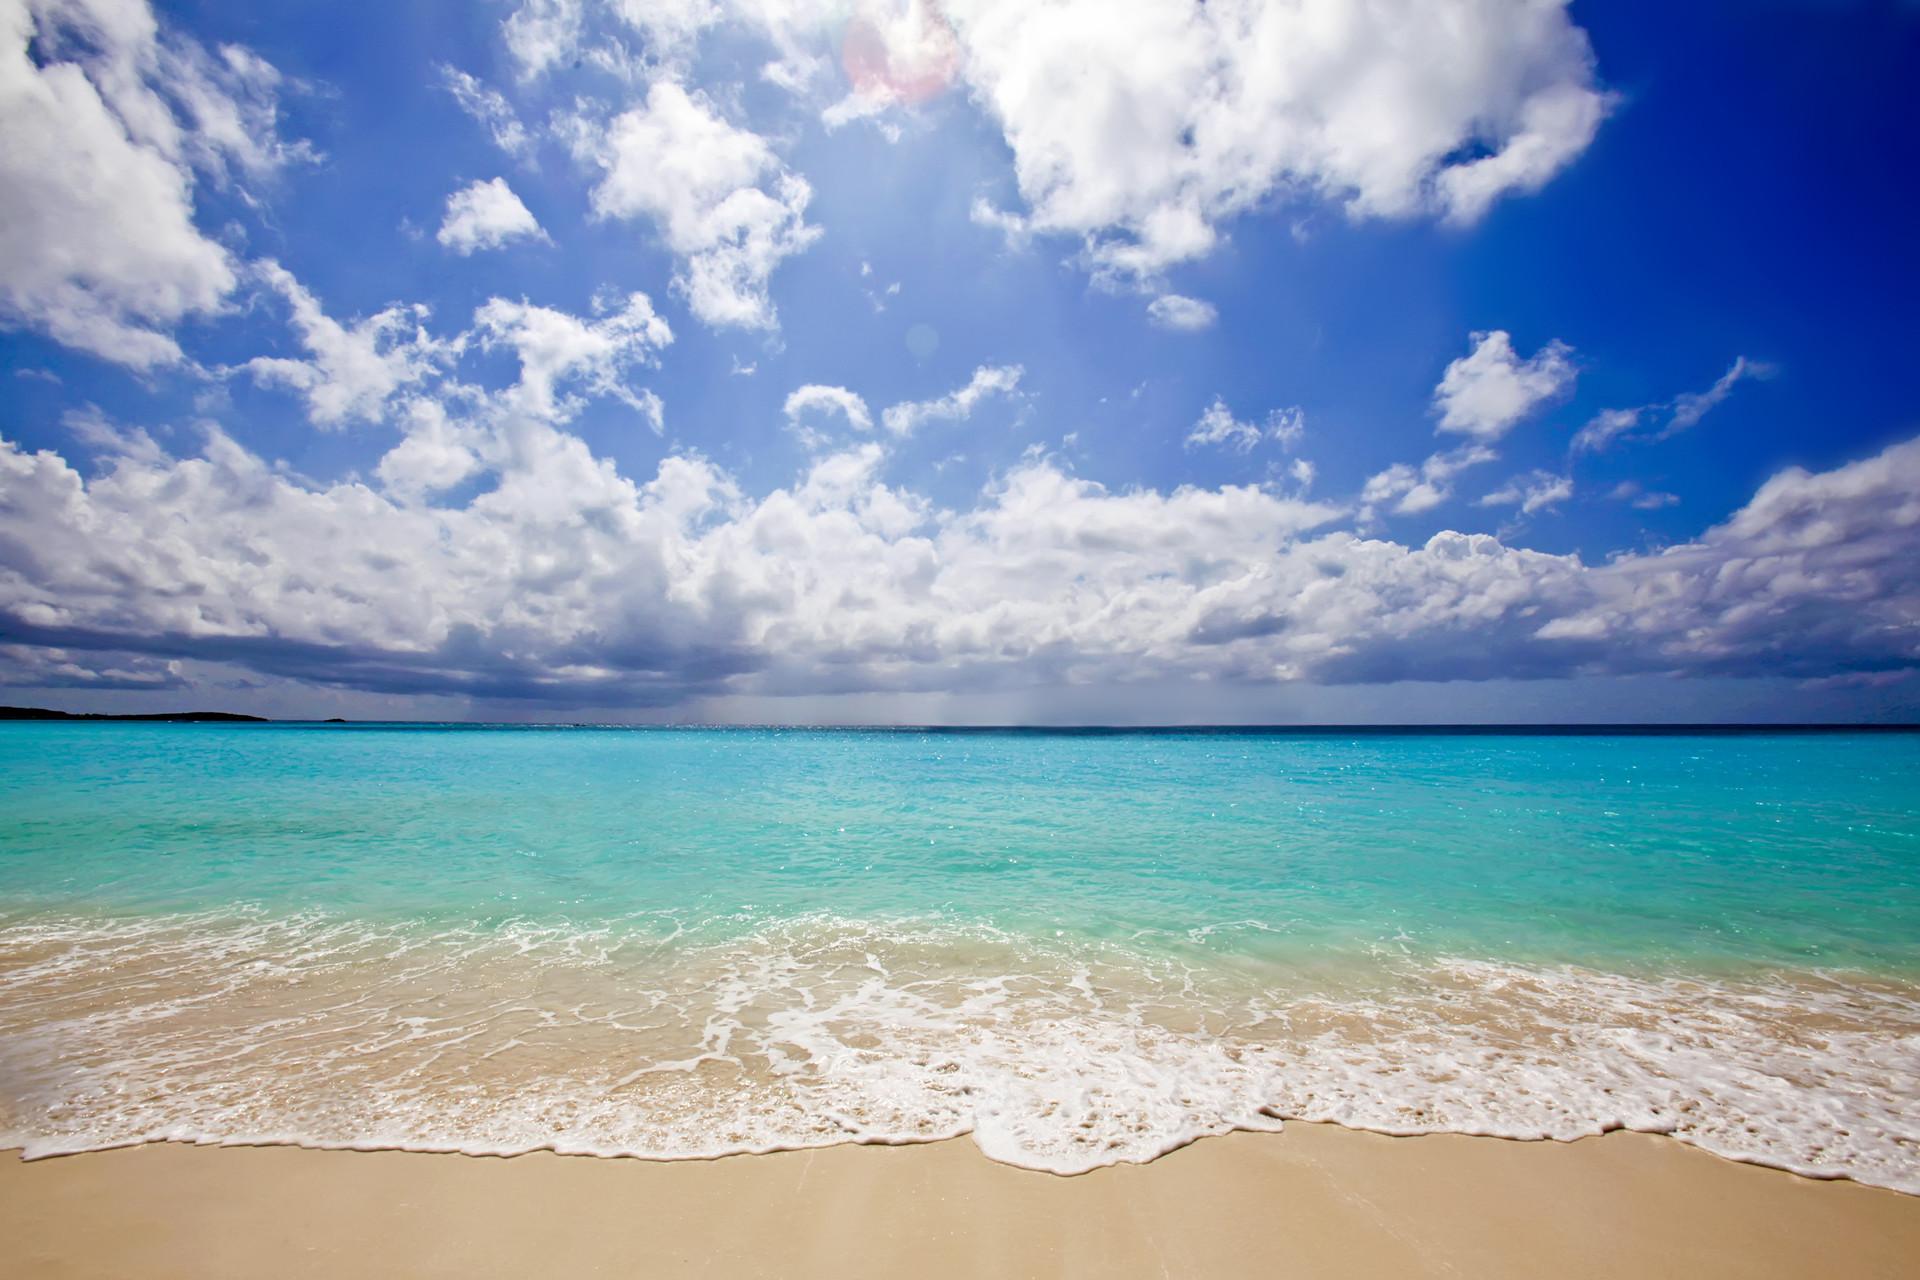 wallpaper beach free download   Desktop Backgrounds for Free HD .